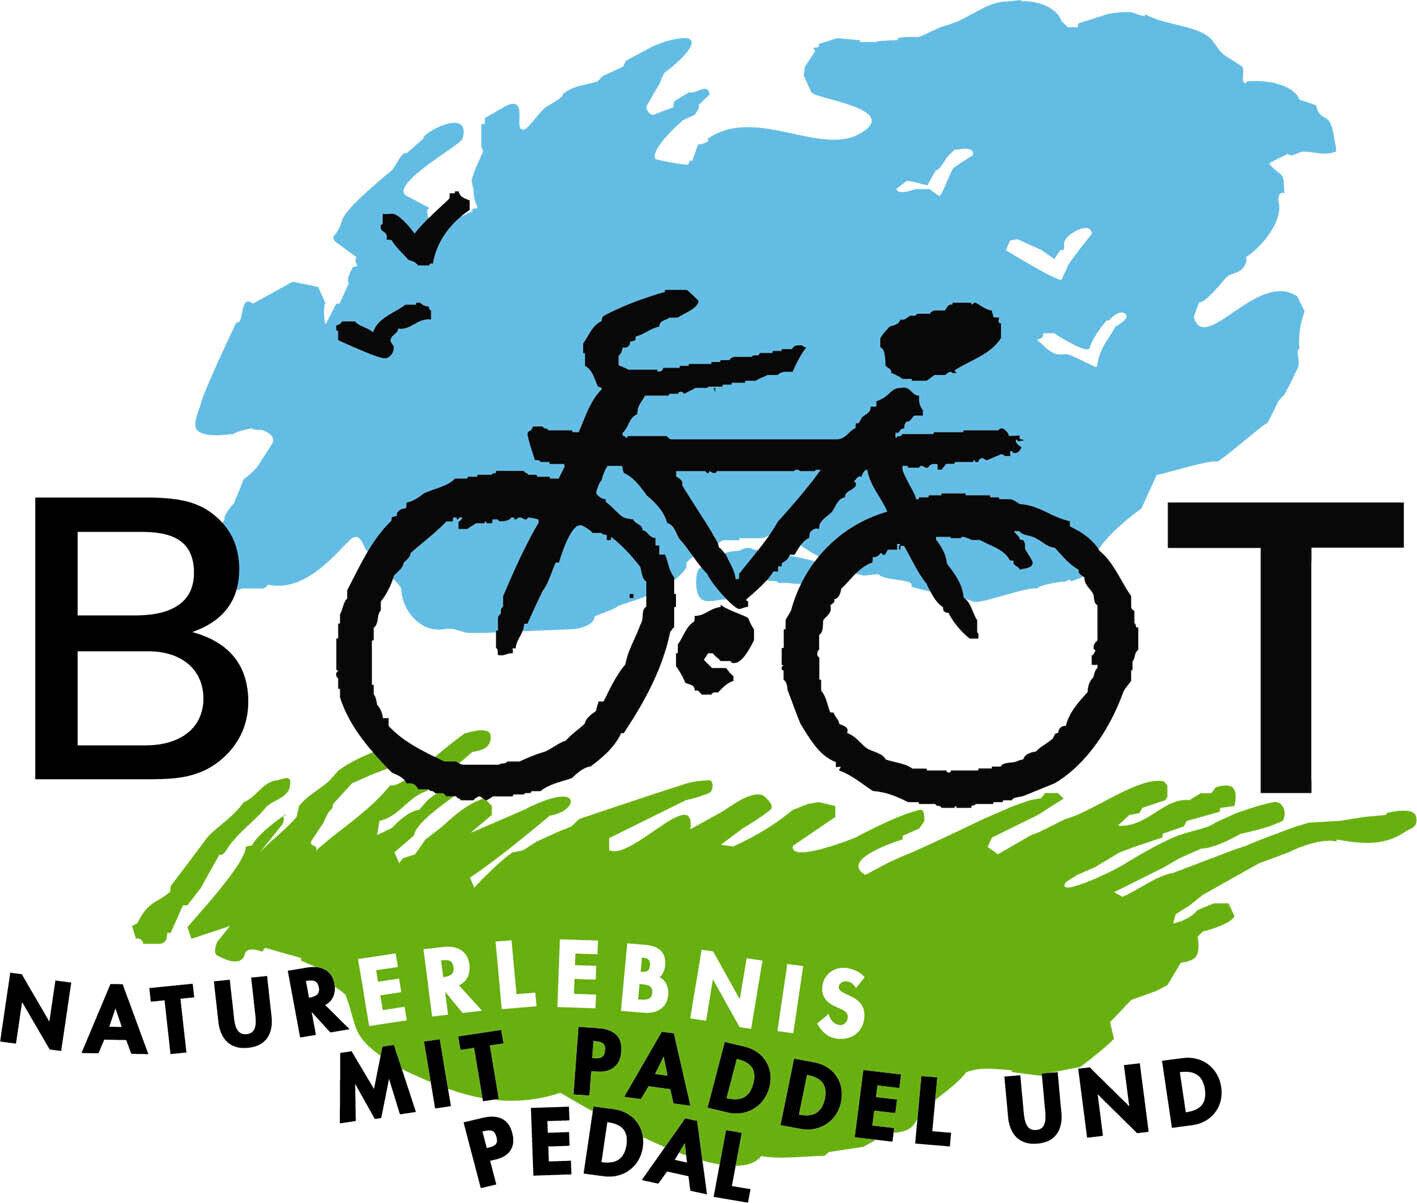 Logo-Paddel-Pedal